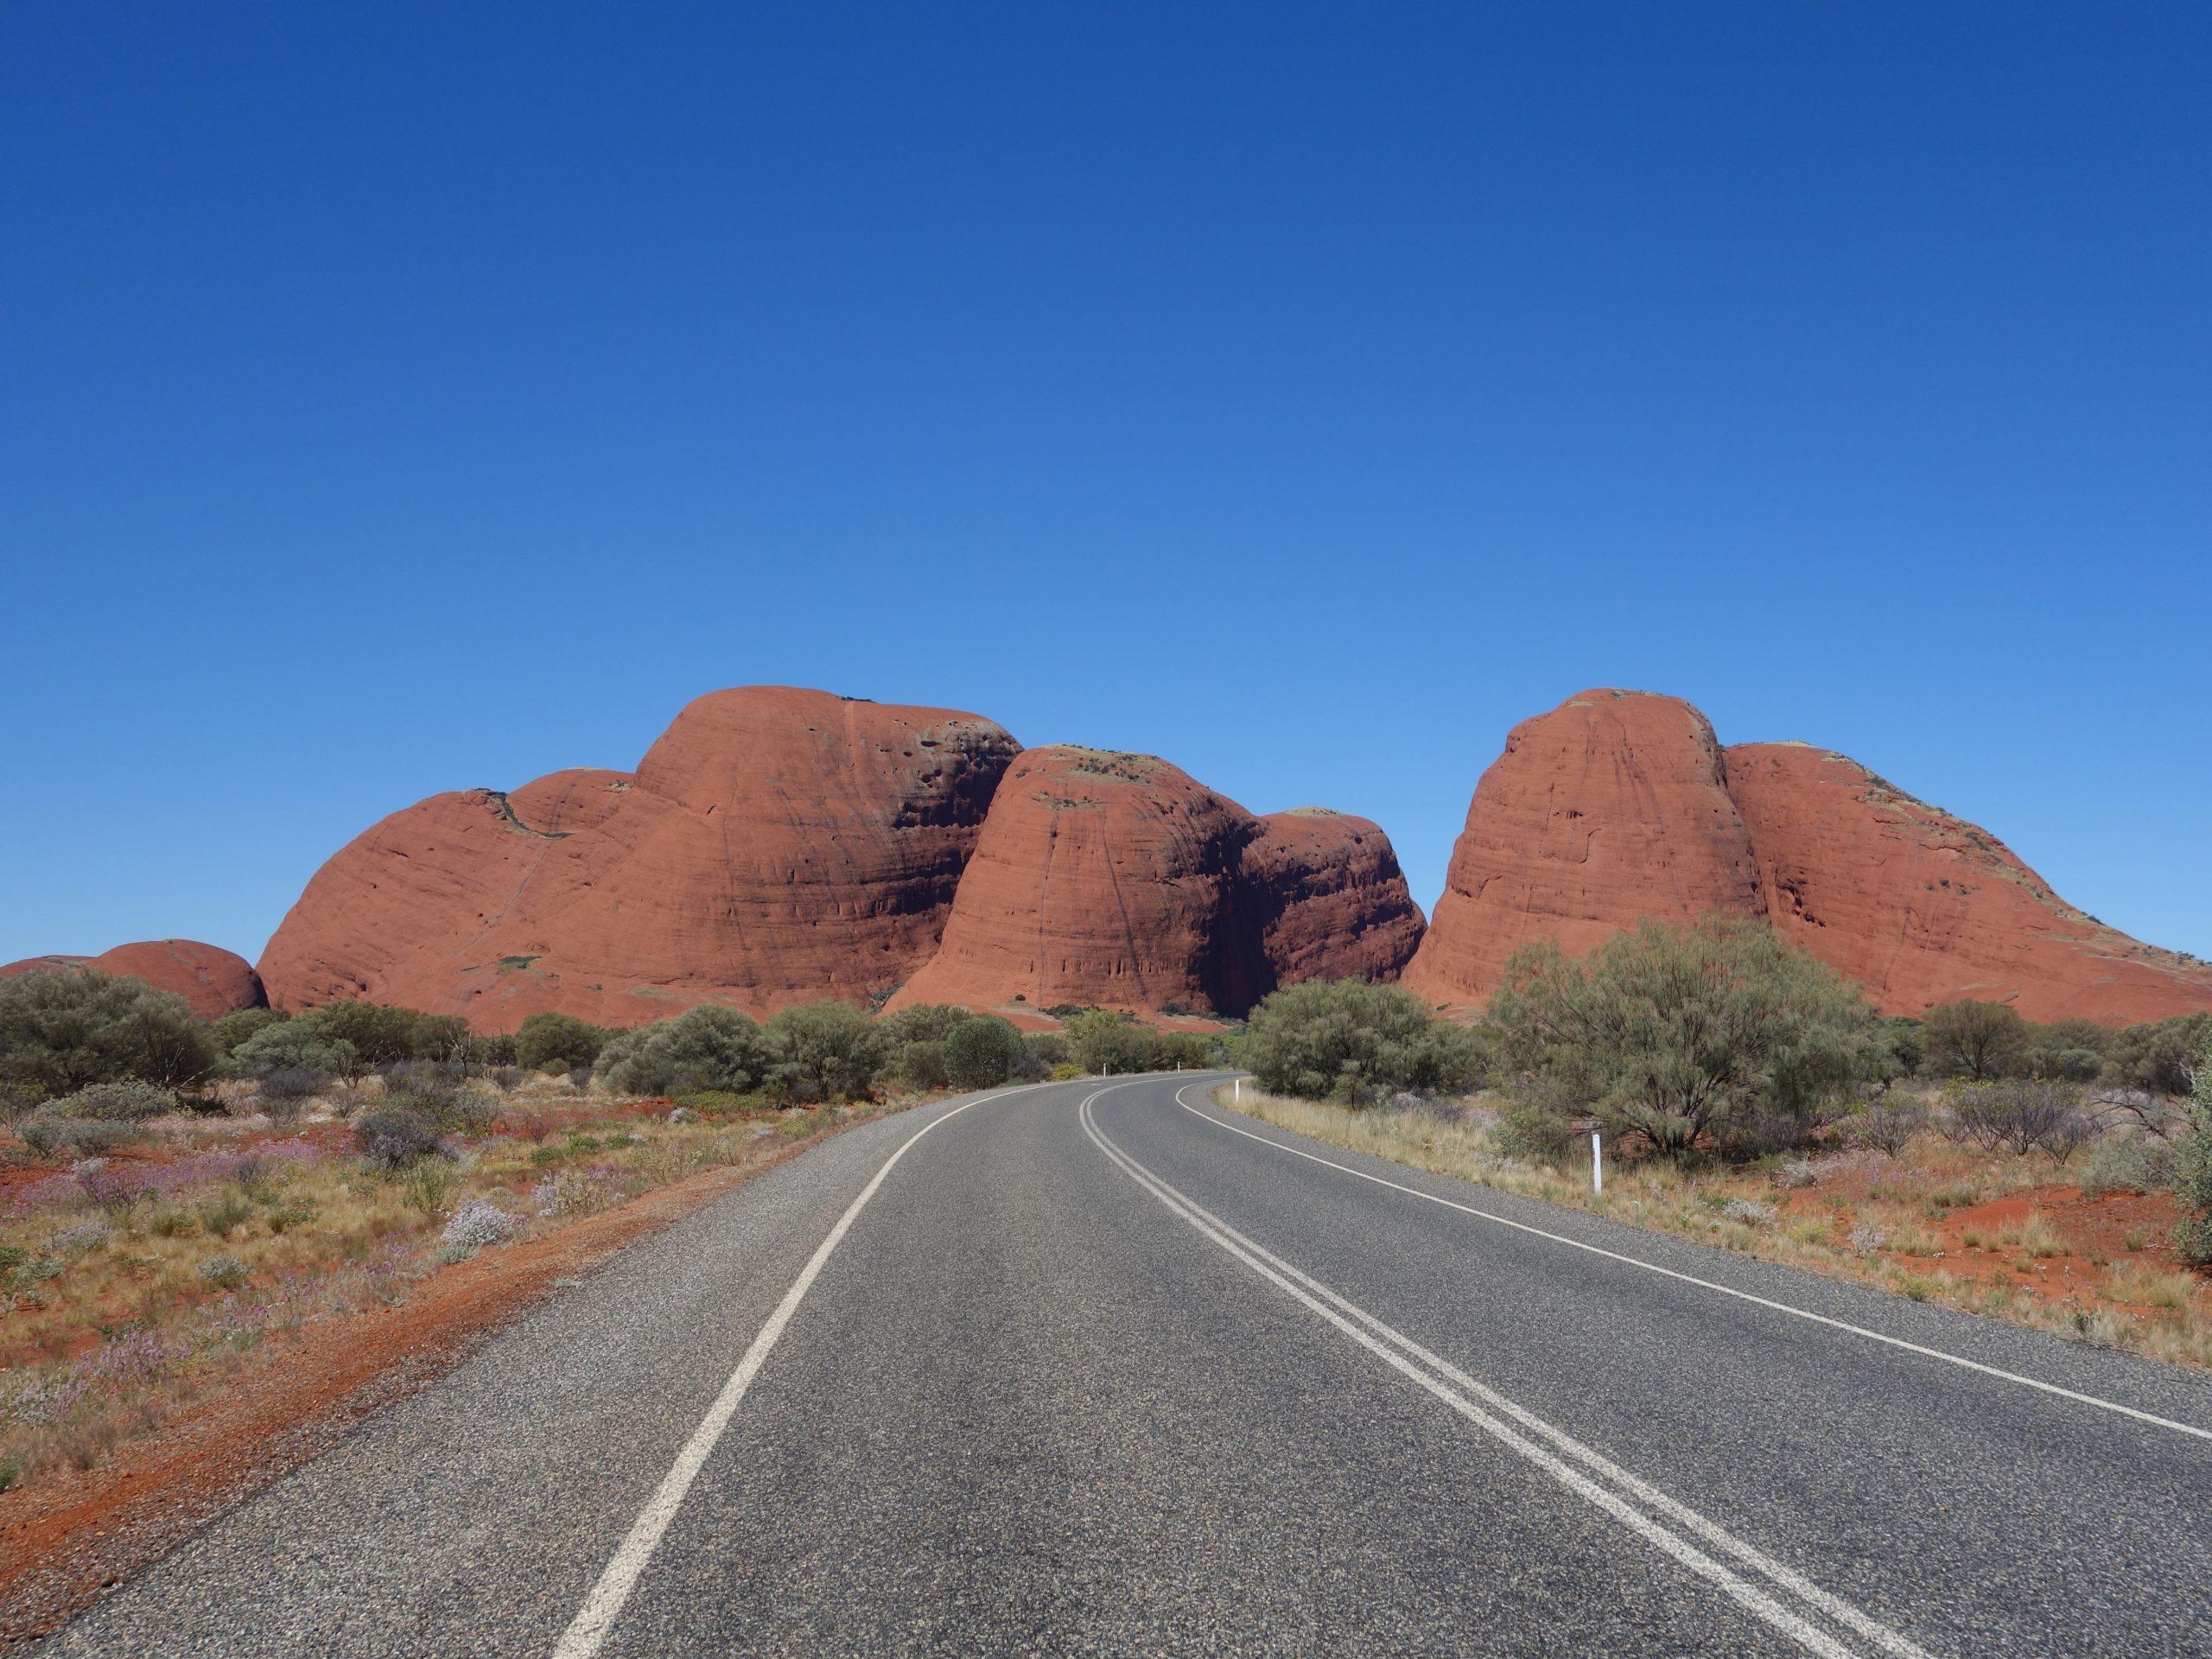 Radreise Australien 2016 - Kata Tjuta